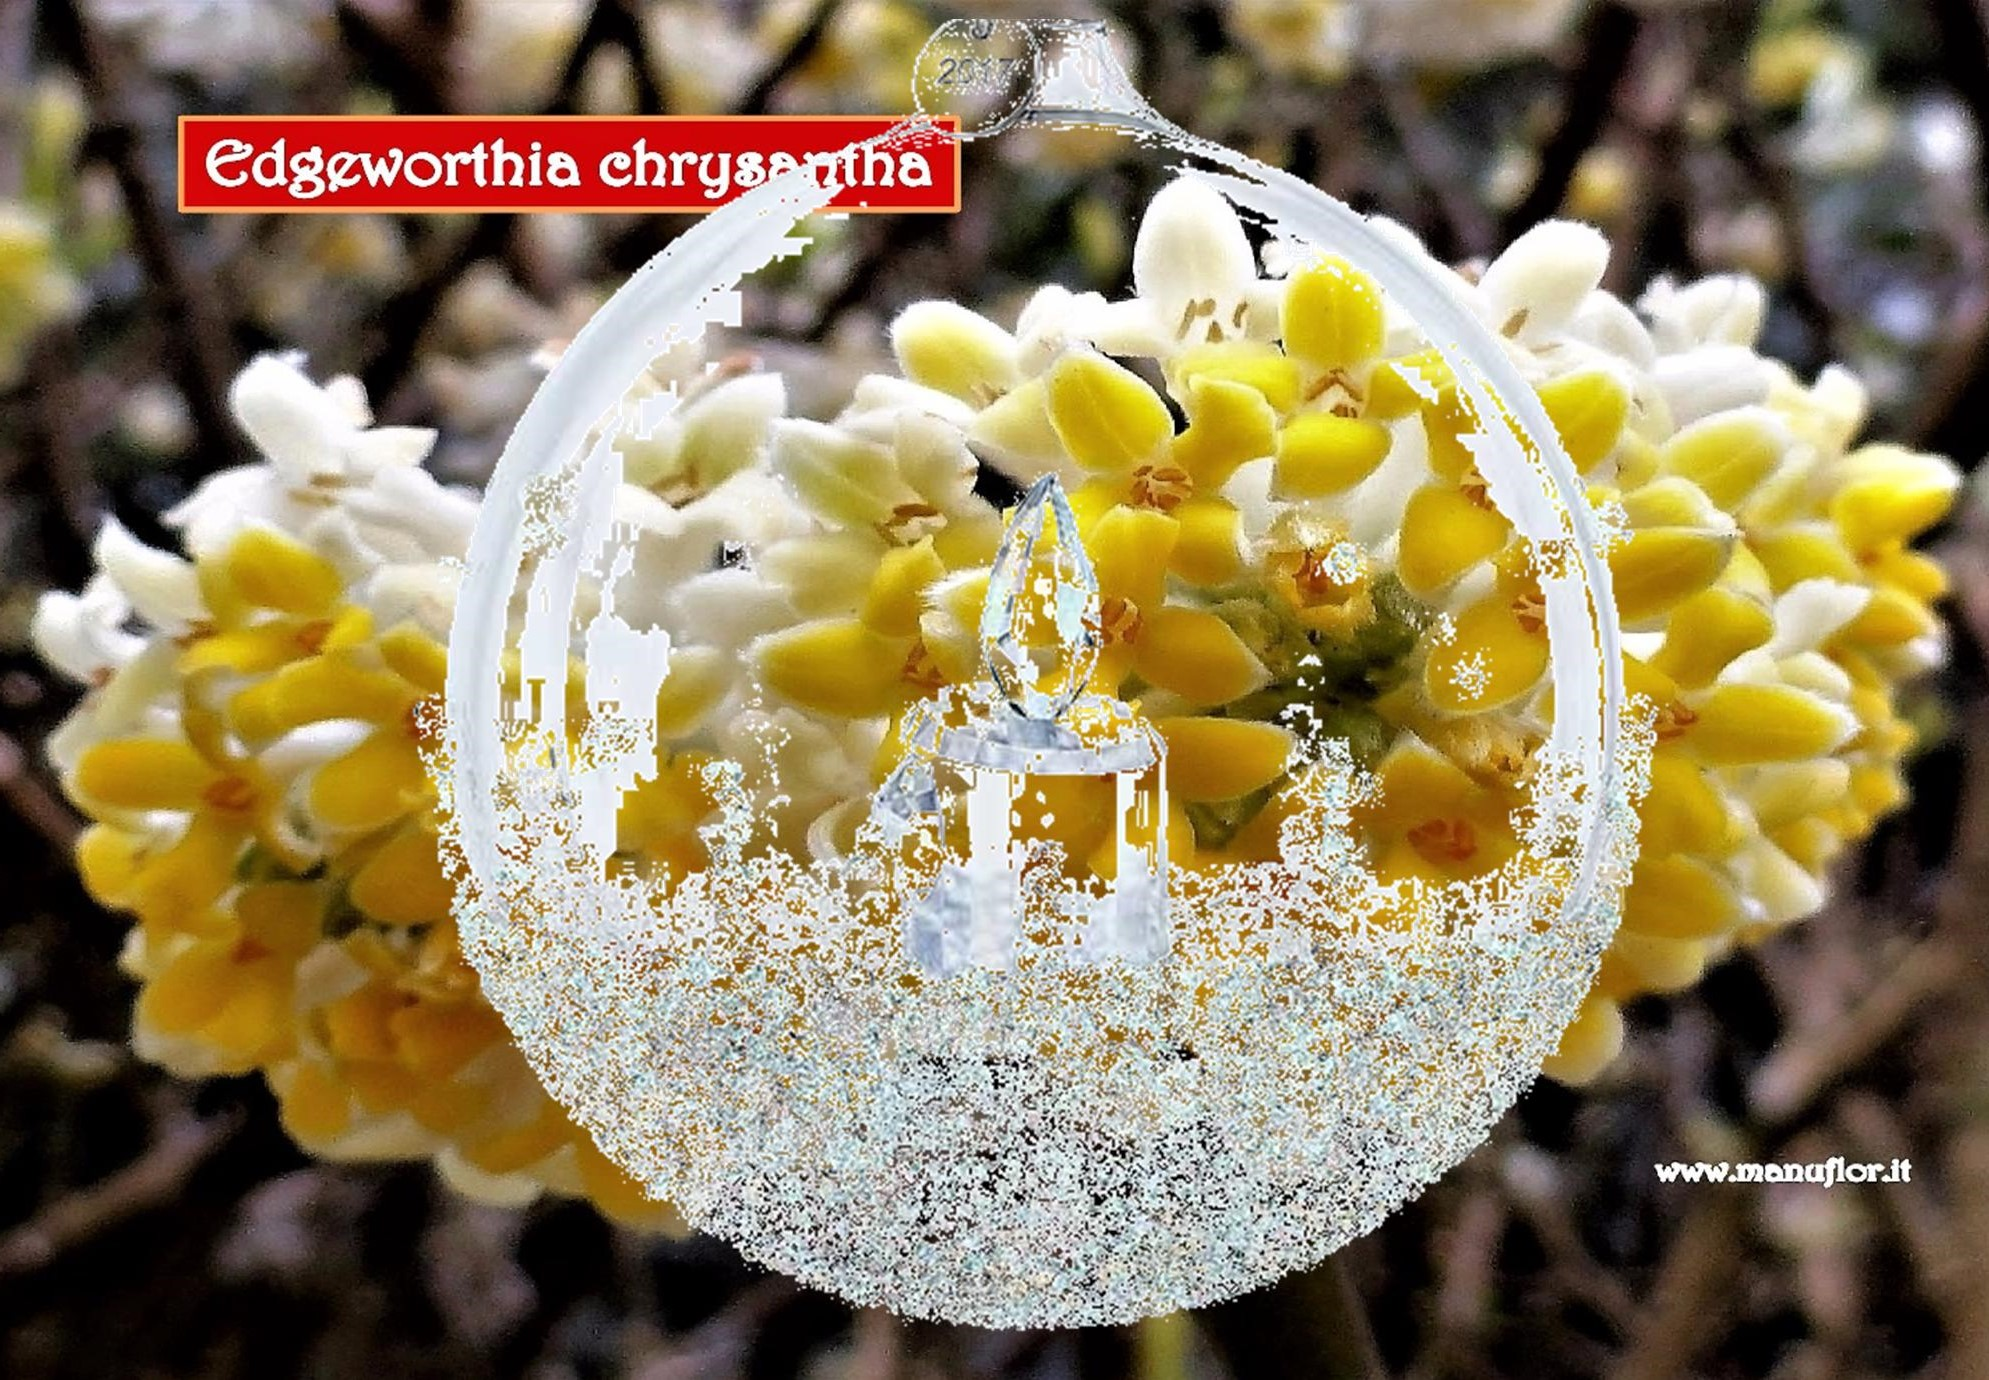 EDGEWORTHIA chrysantha - Con Manuflor, elegante regalo! Una pianta protagonista,